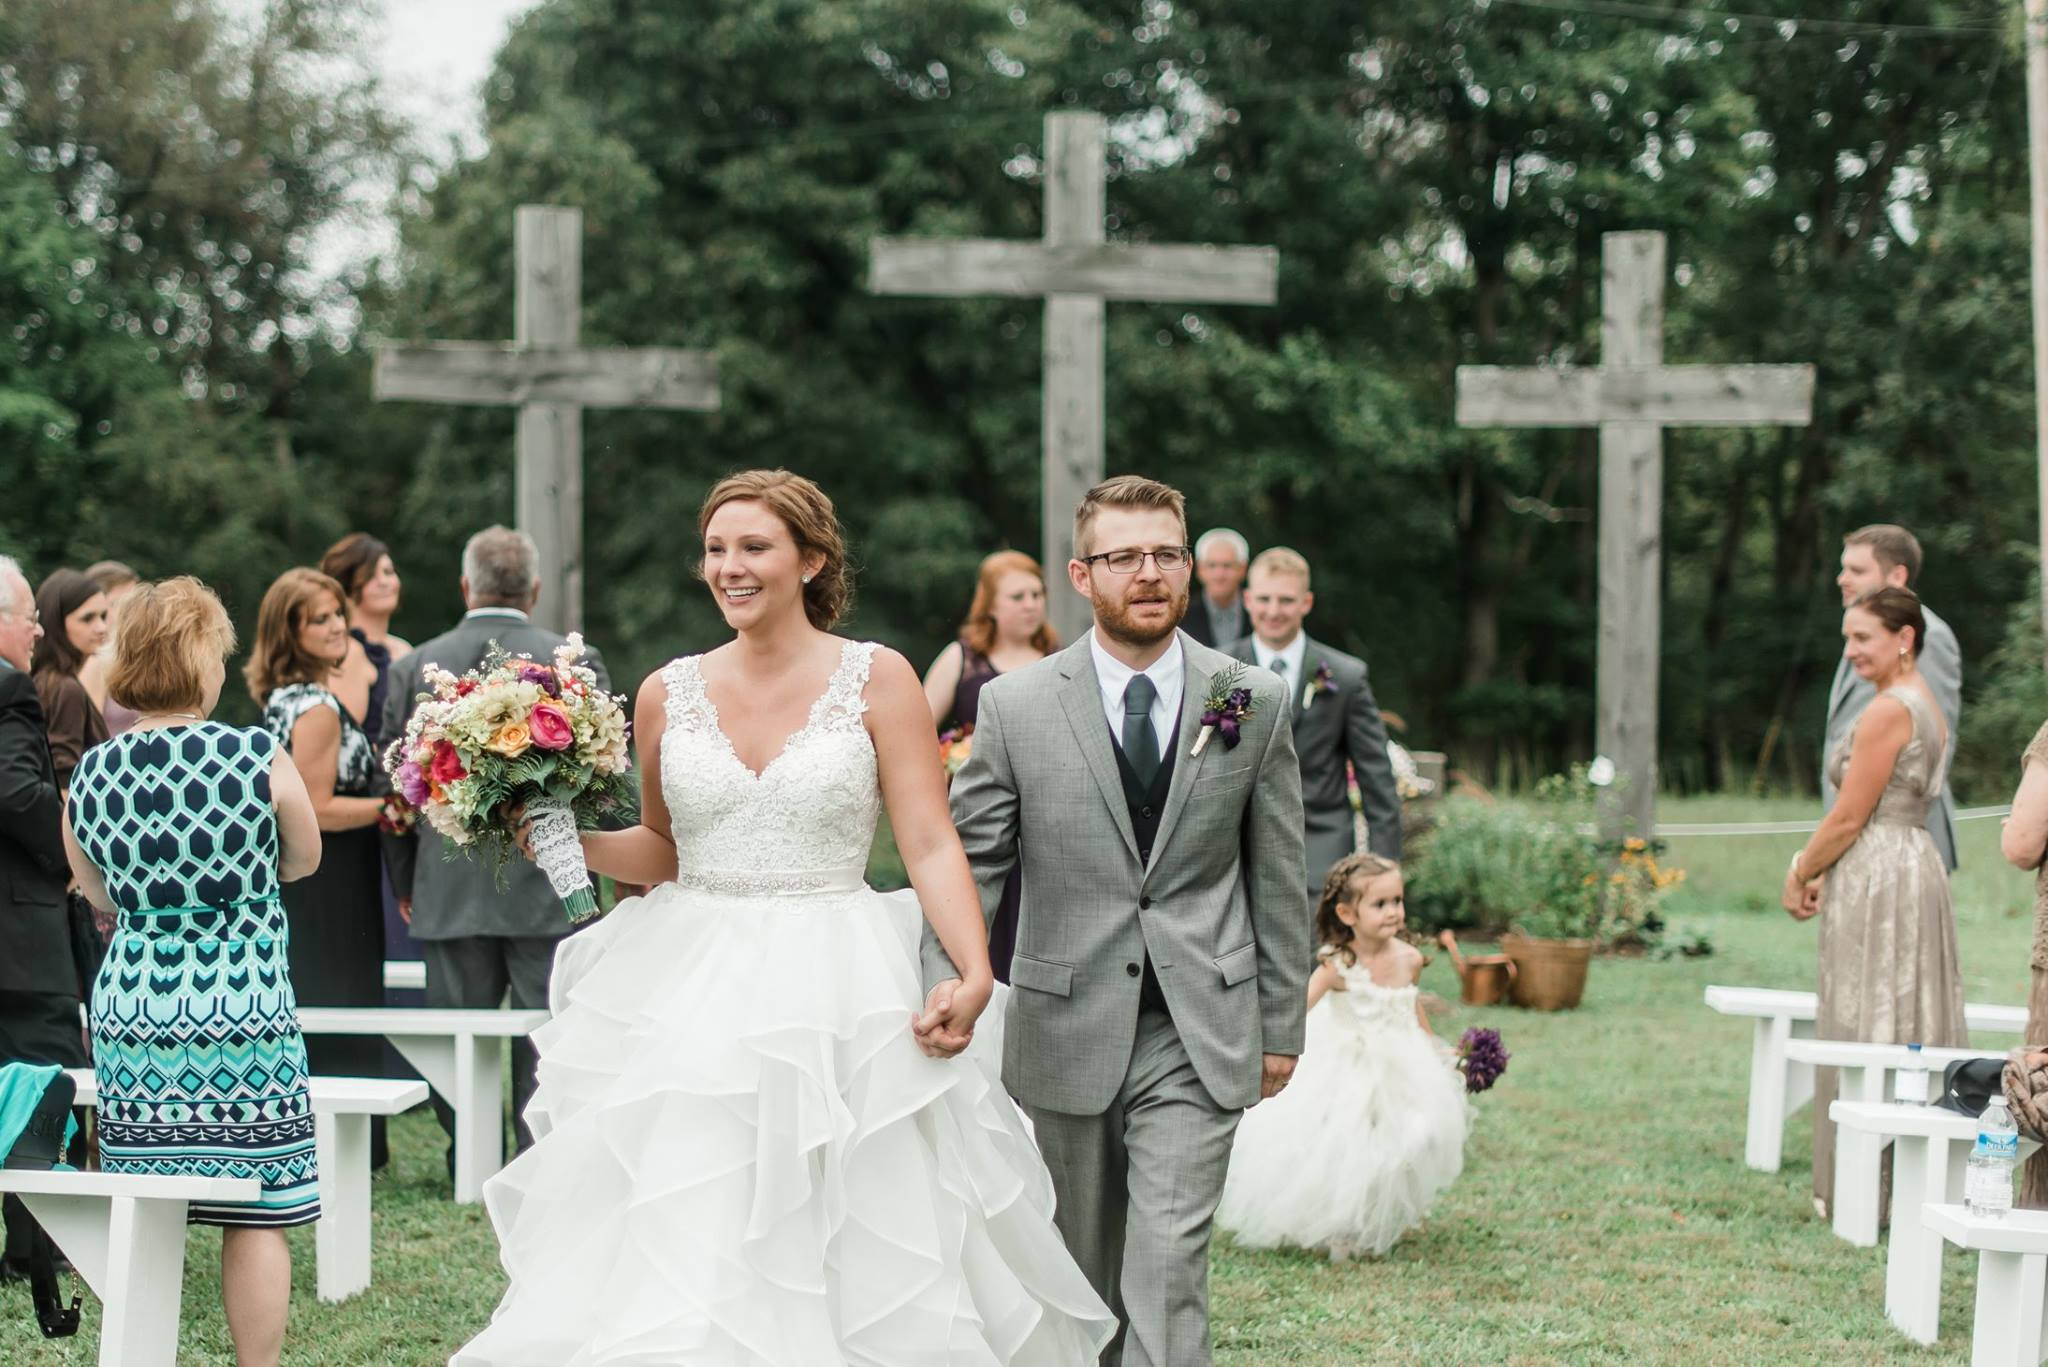 pennsylvania-backyard-wedding-love-diy-bohemian-romantic-colorful-0029.jpg